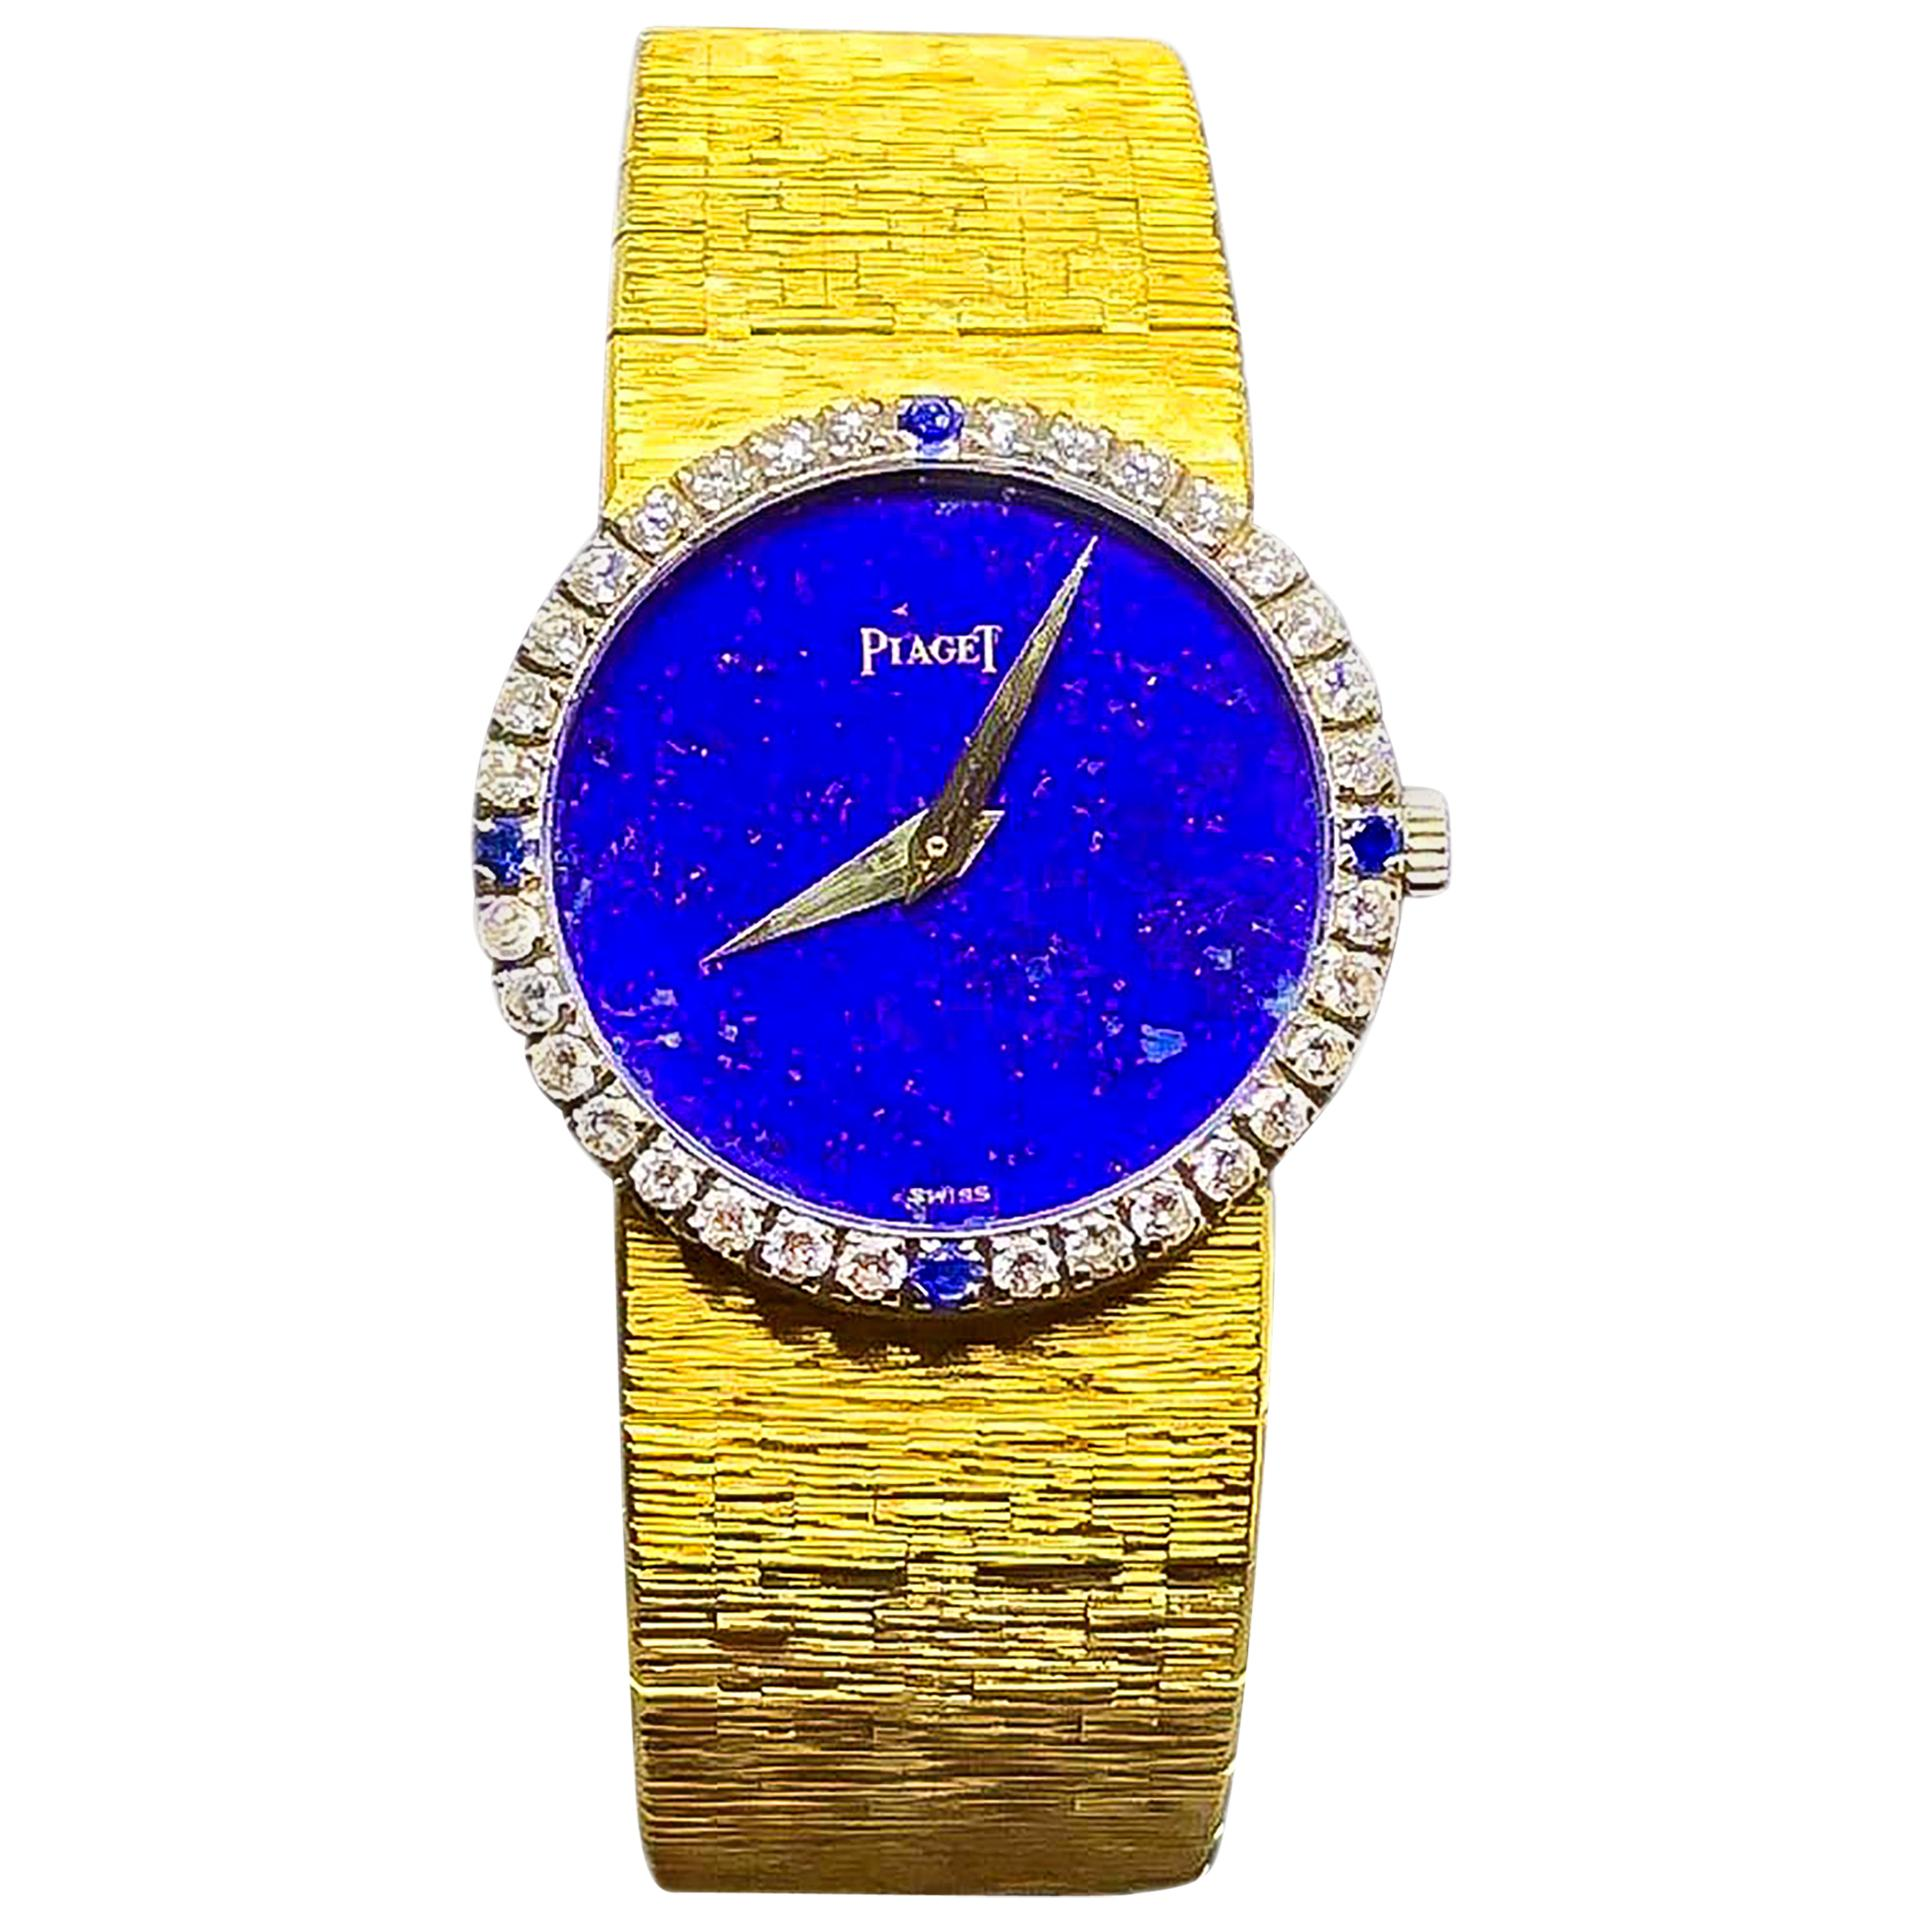 1970s Piaget 18 Karat Yellow Gold Lapis Diamond Sapphire Bracelet Watch